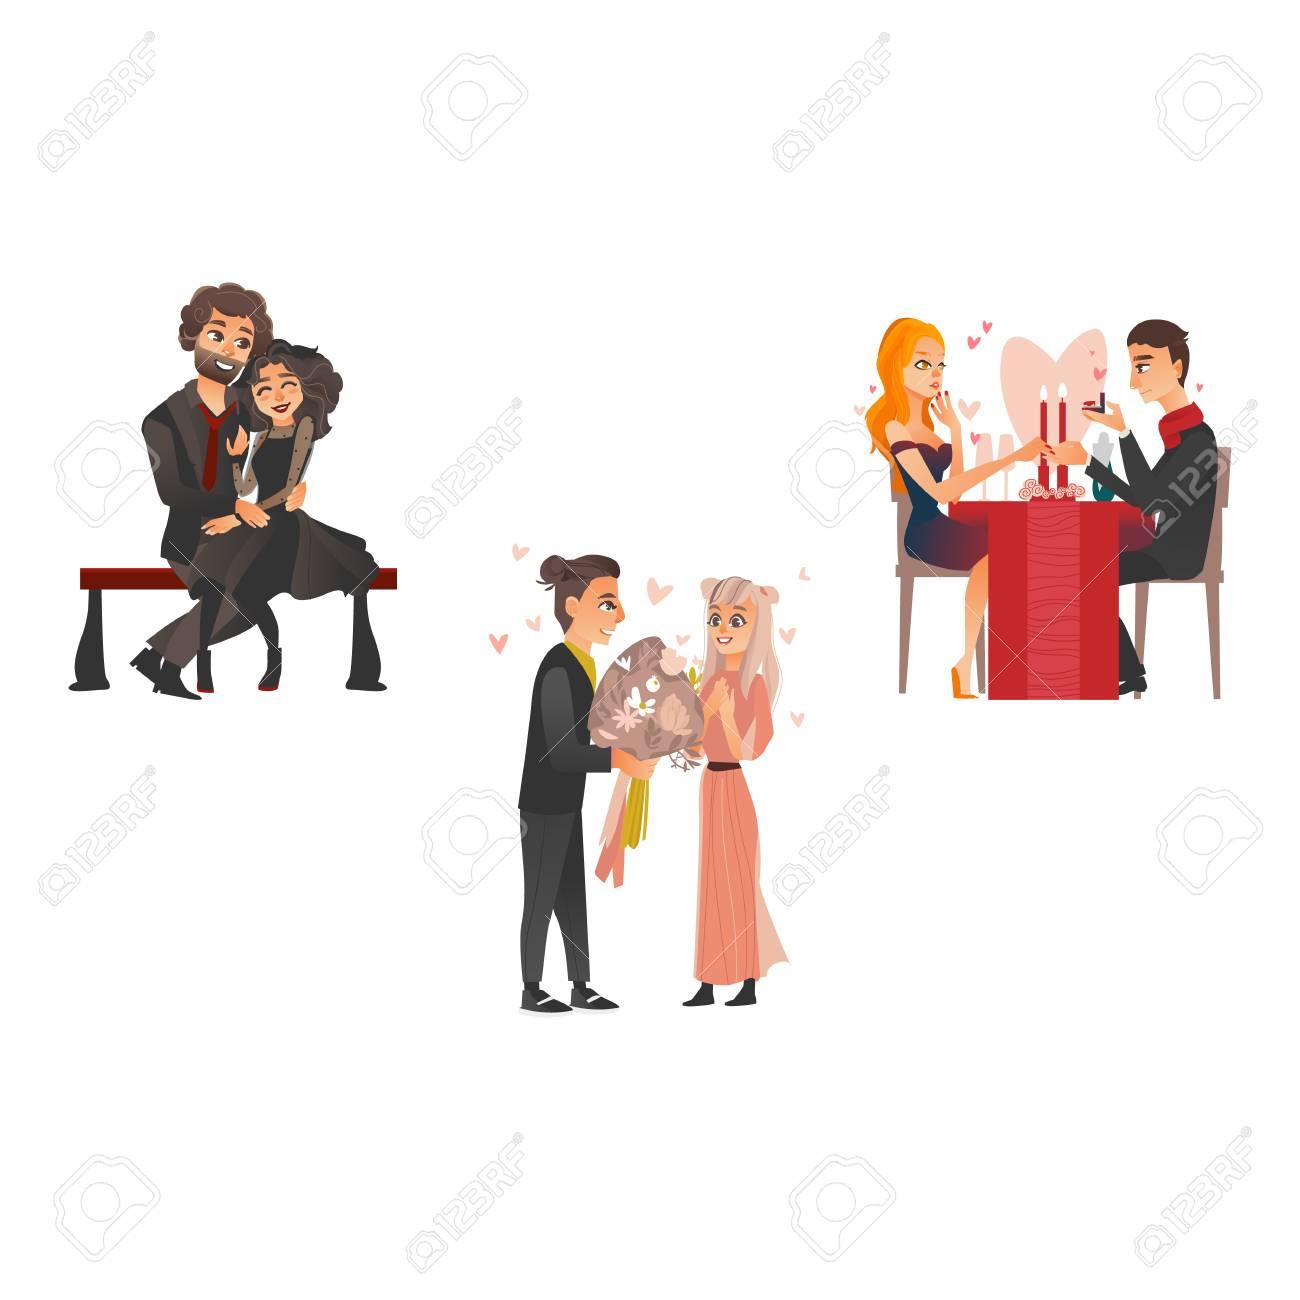 Vector Bonitos Casais Apaixonados Namorando No Dia Dos Namorados